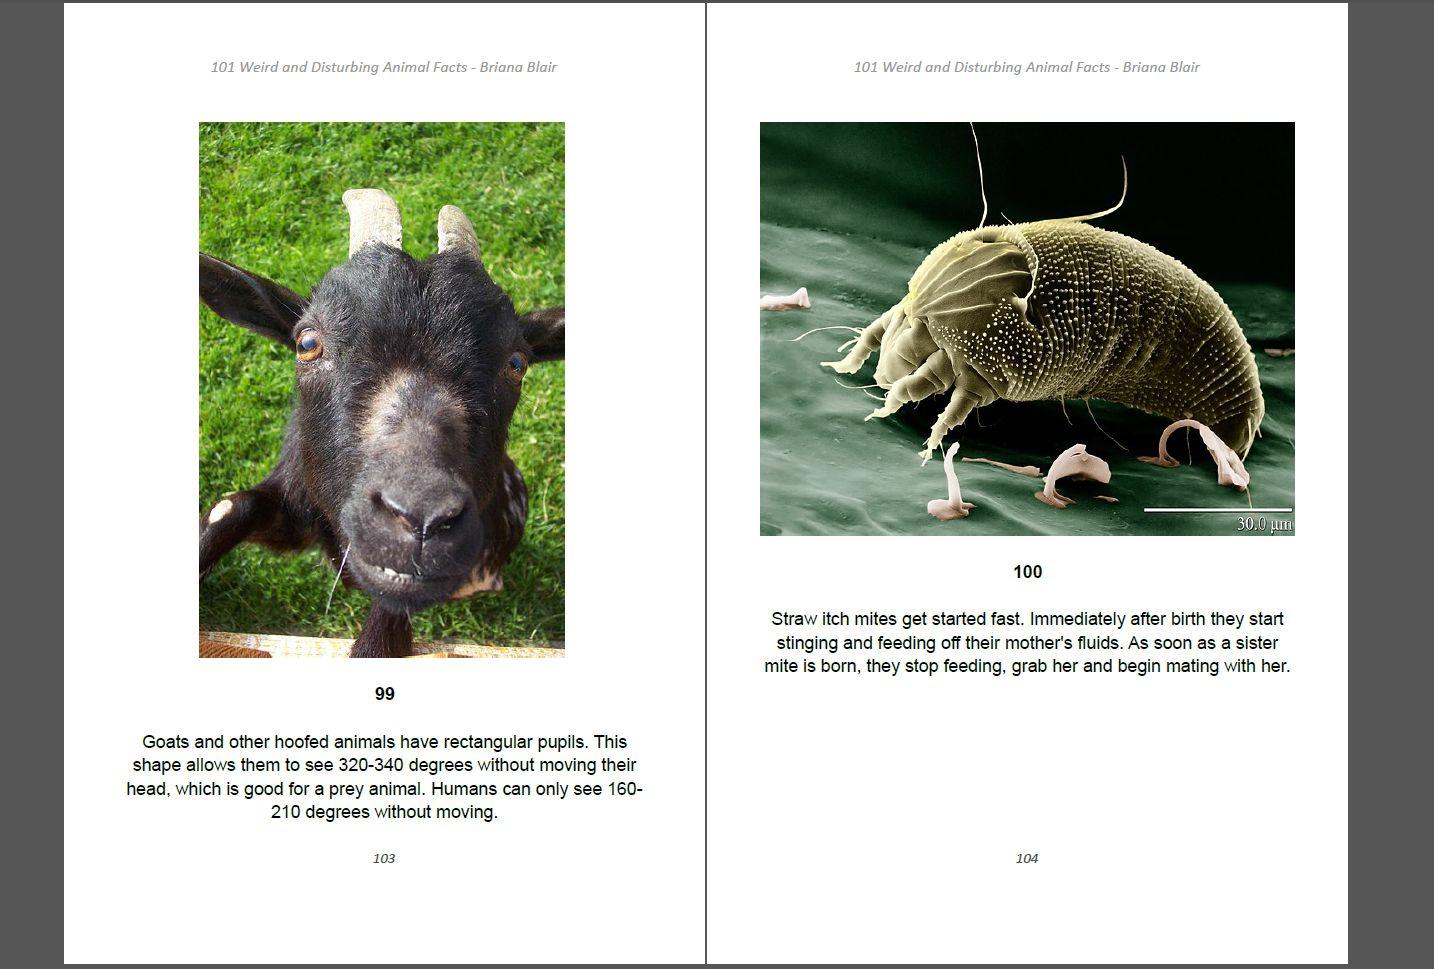 101 Weird and Disturbing Animal Facts by Briana Blair - Nature Ebook 4